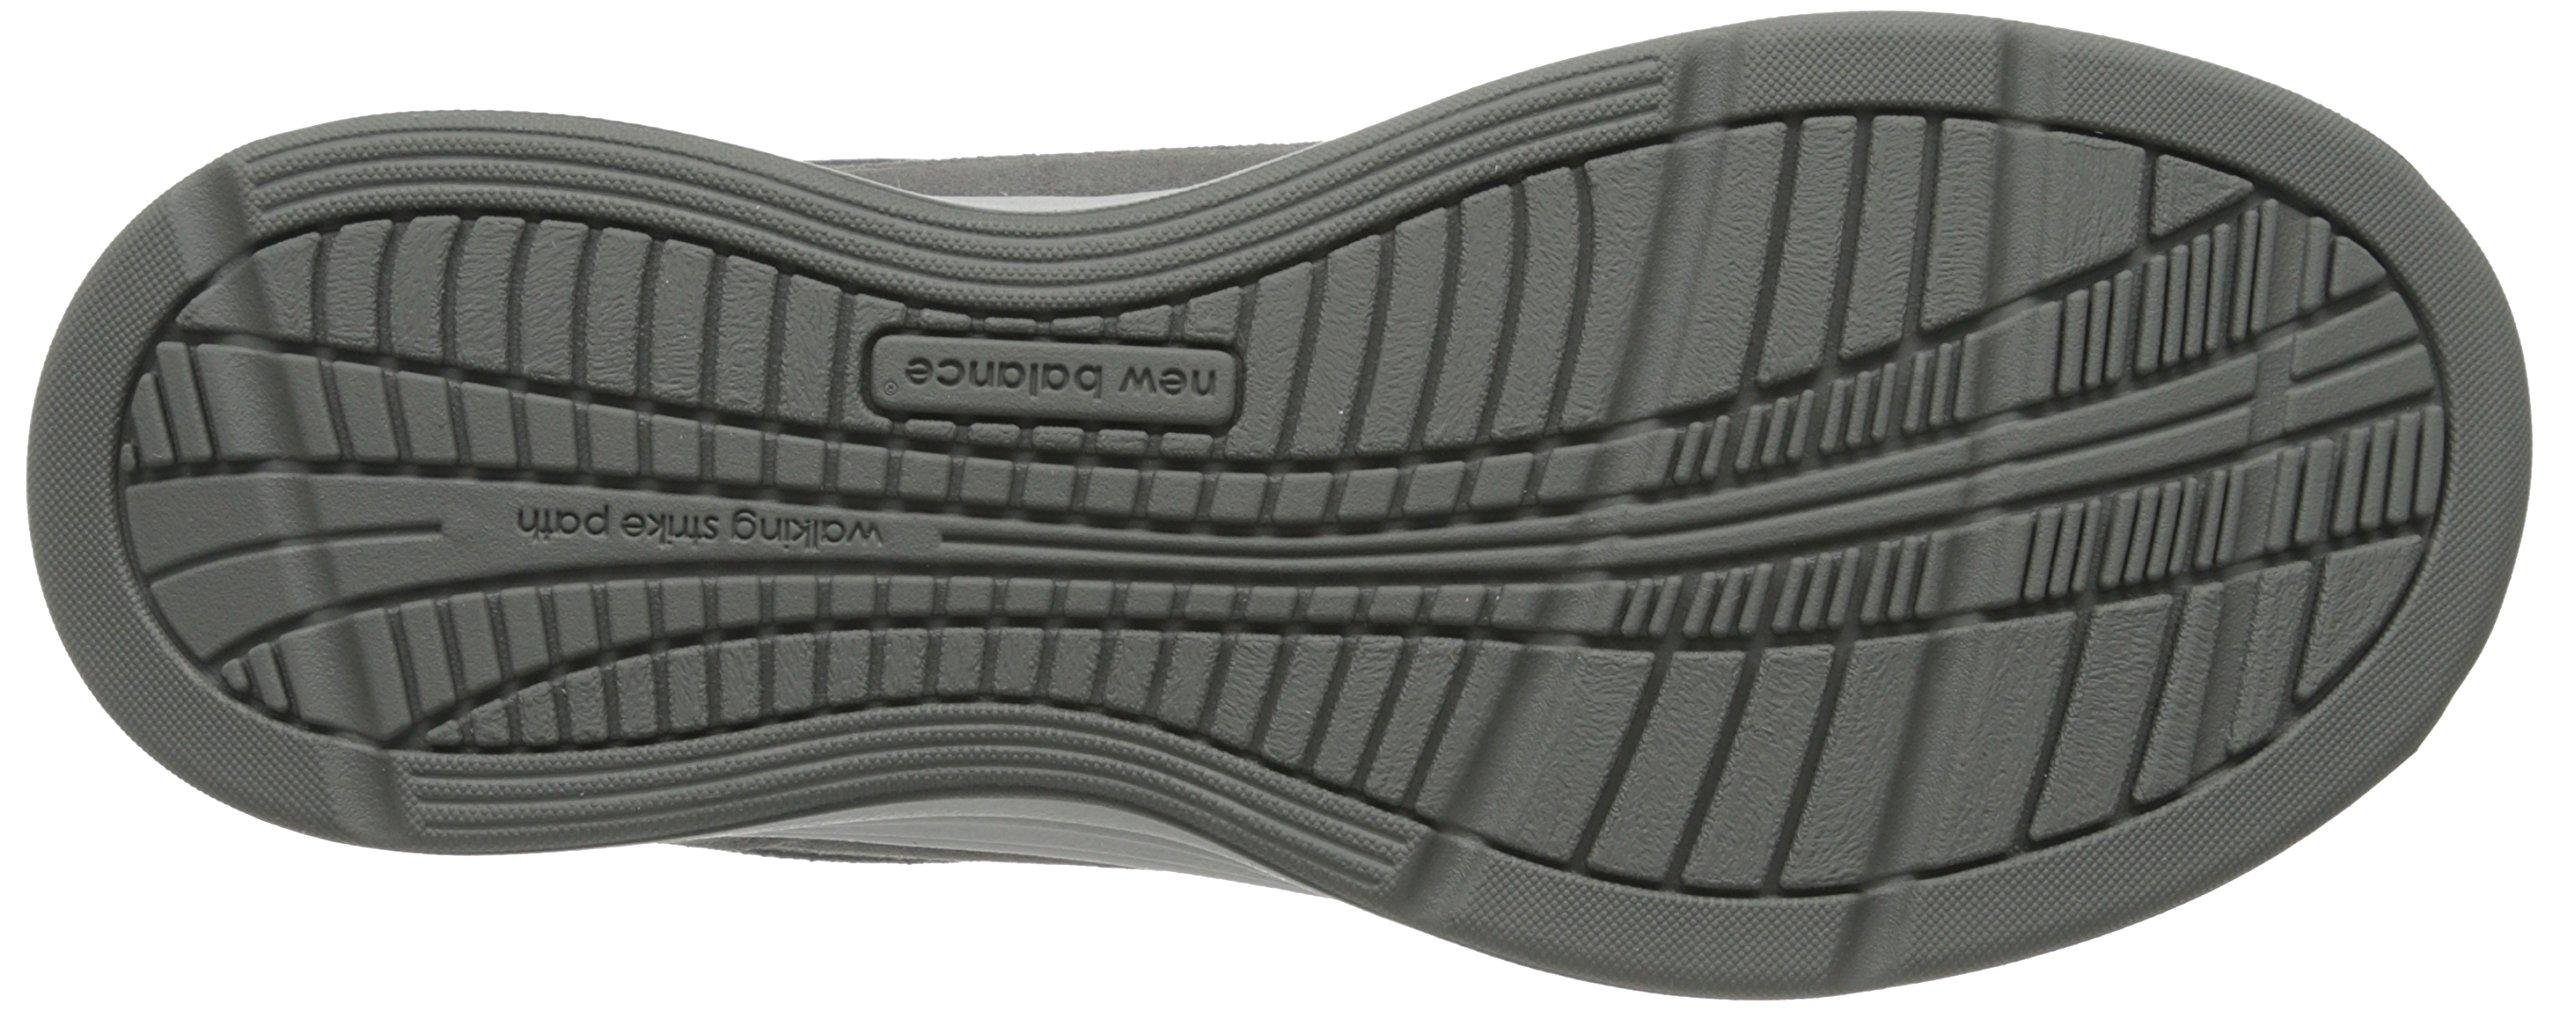 Balance Mens Mw877 Walking Shoe Grey 11